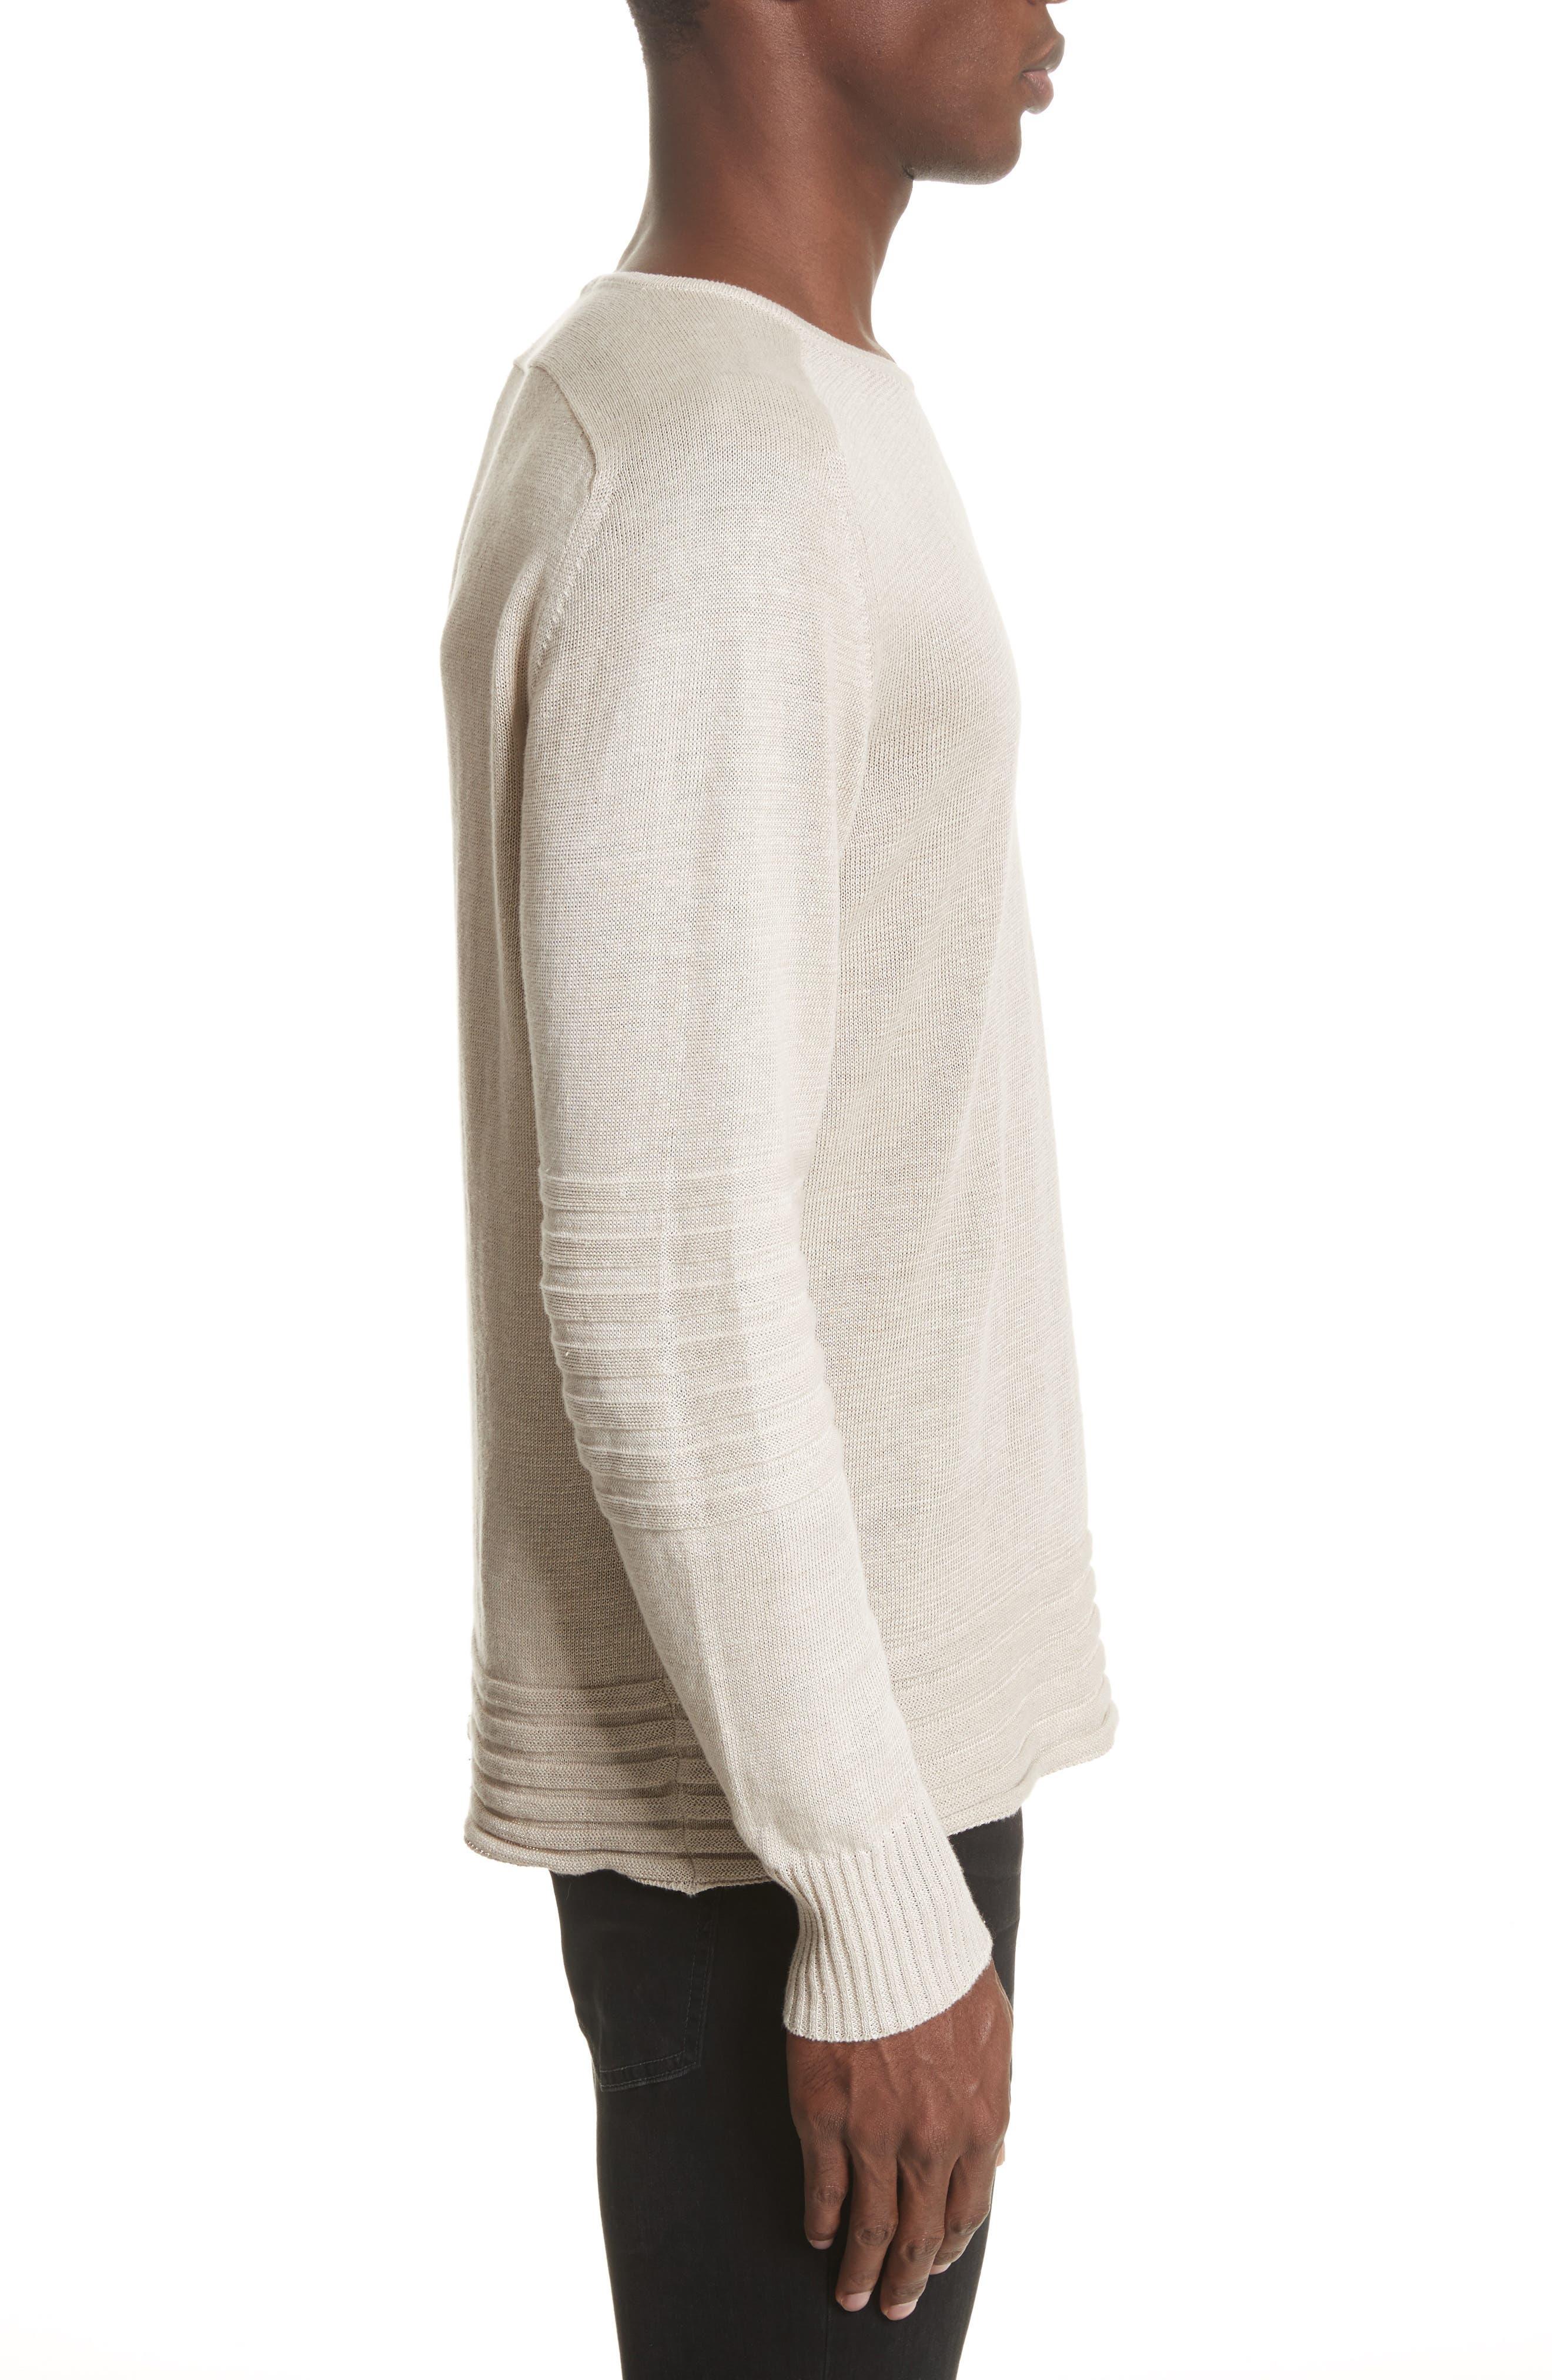 Exford Linen Crewneck Sweater,                             Alternate thumbnail 4, color,                             Light Sand